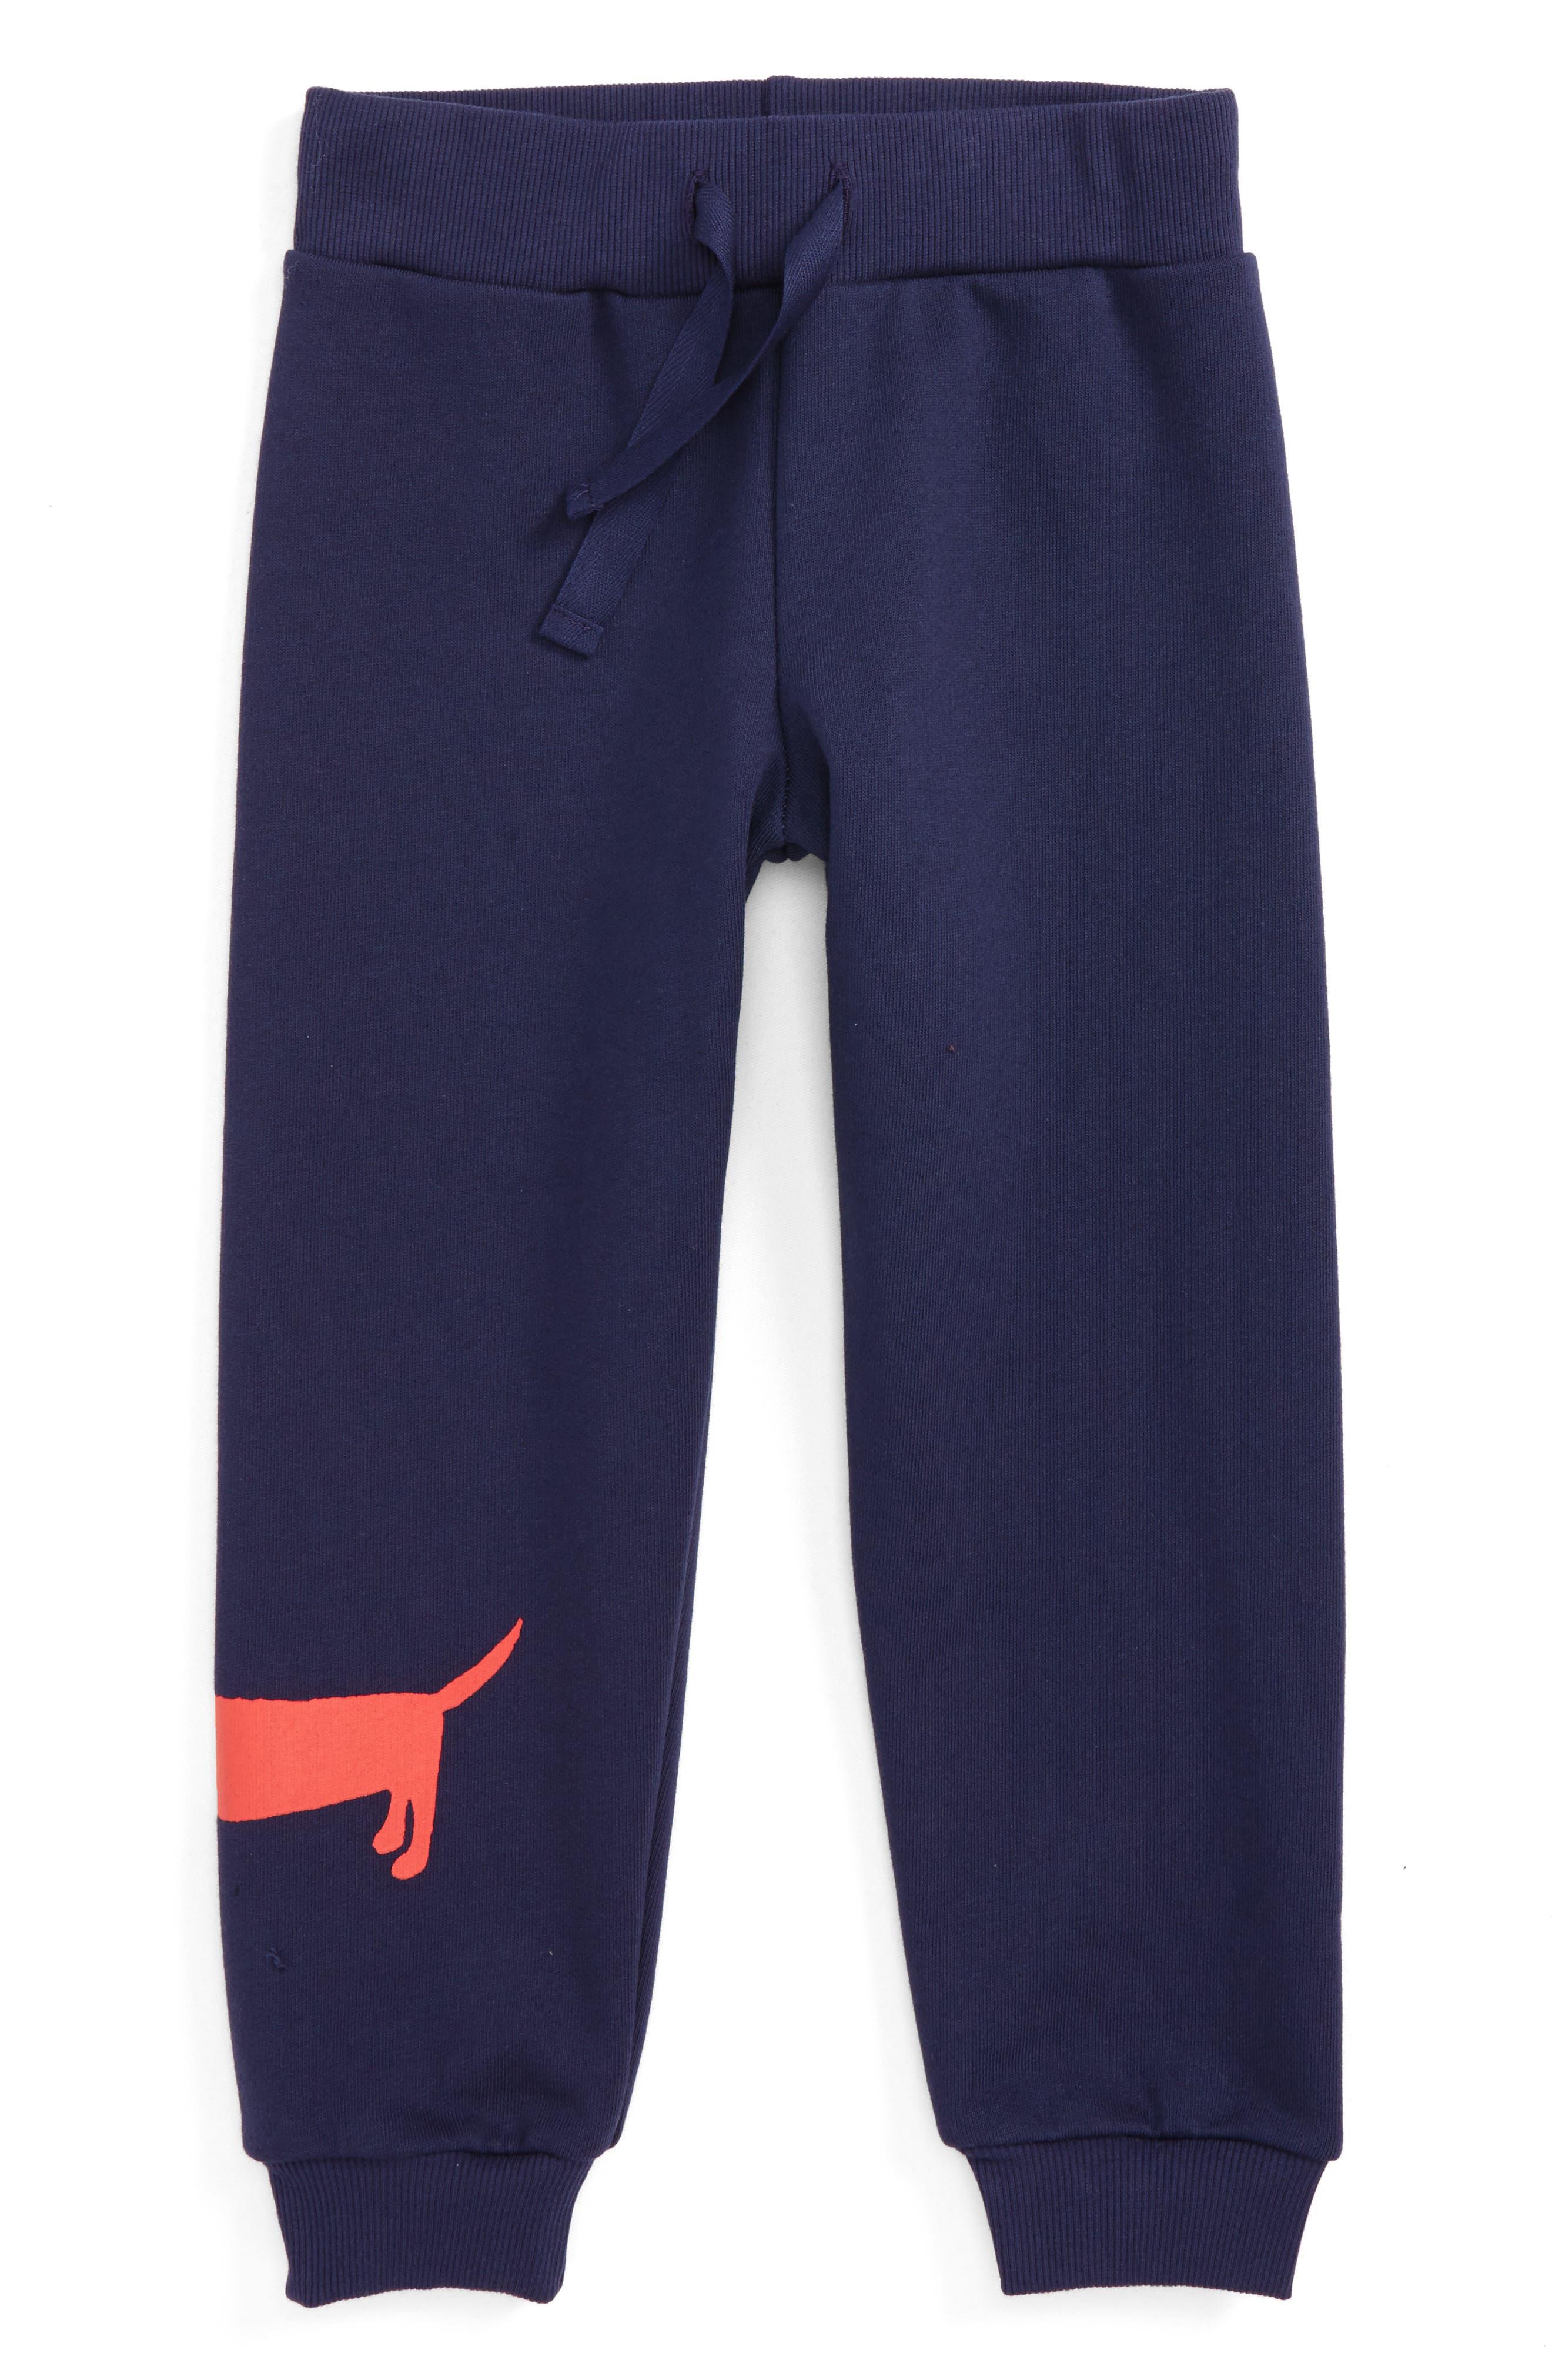 Dog Sweatpants,                         Main,                         color, Navy